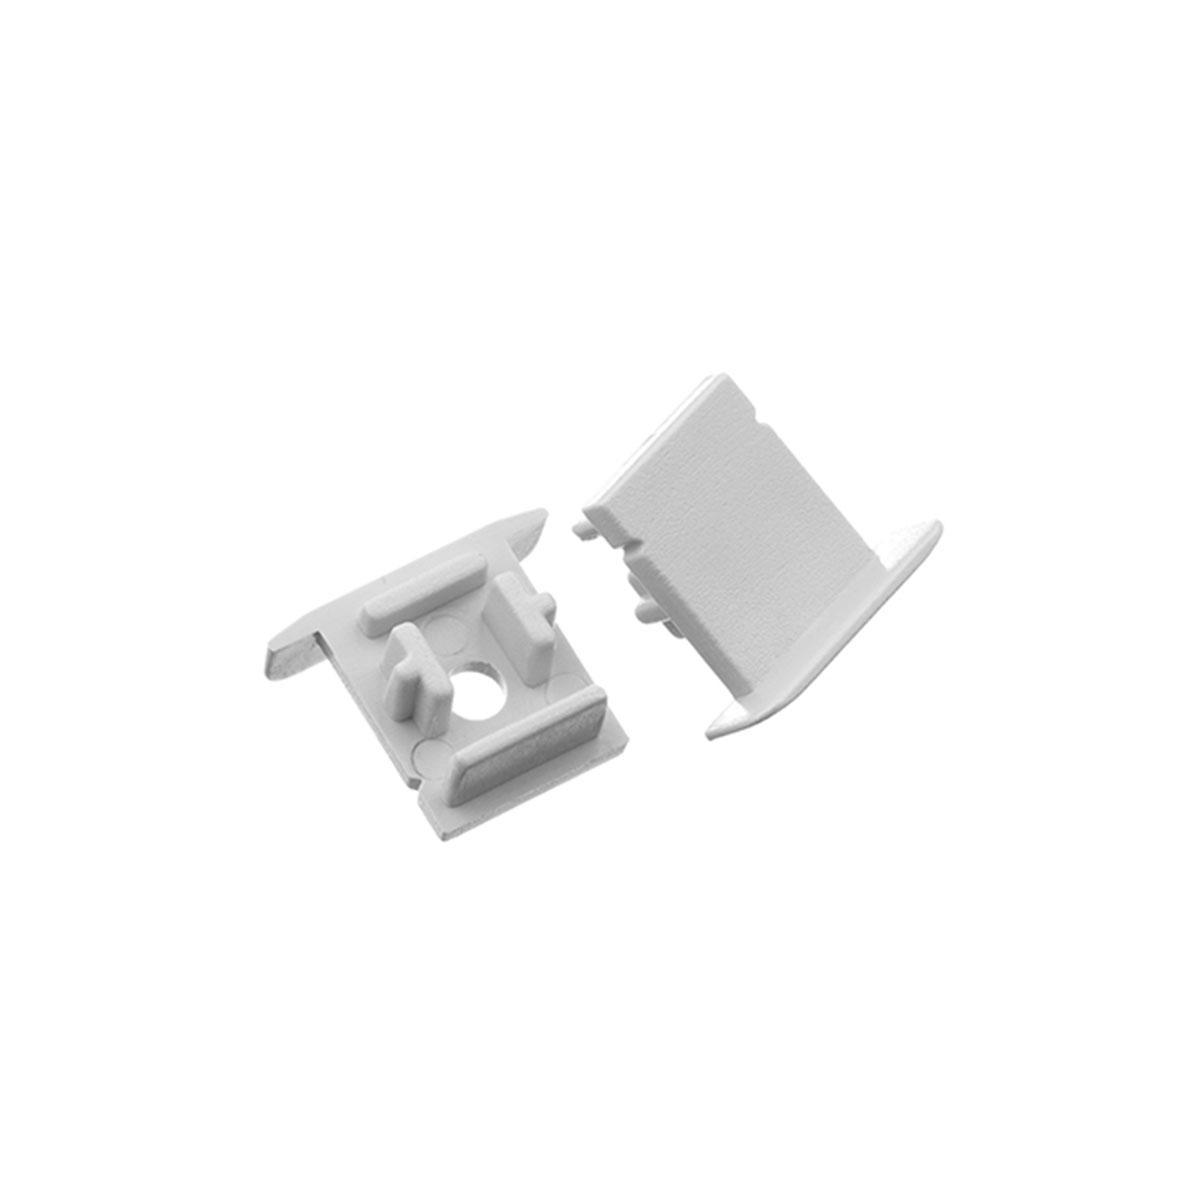 1 Paar Endkappen für Fugen-Profil 18 x 15mm (4300)